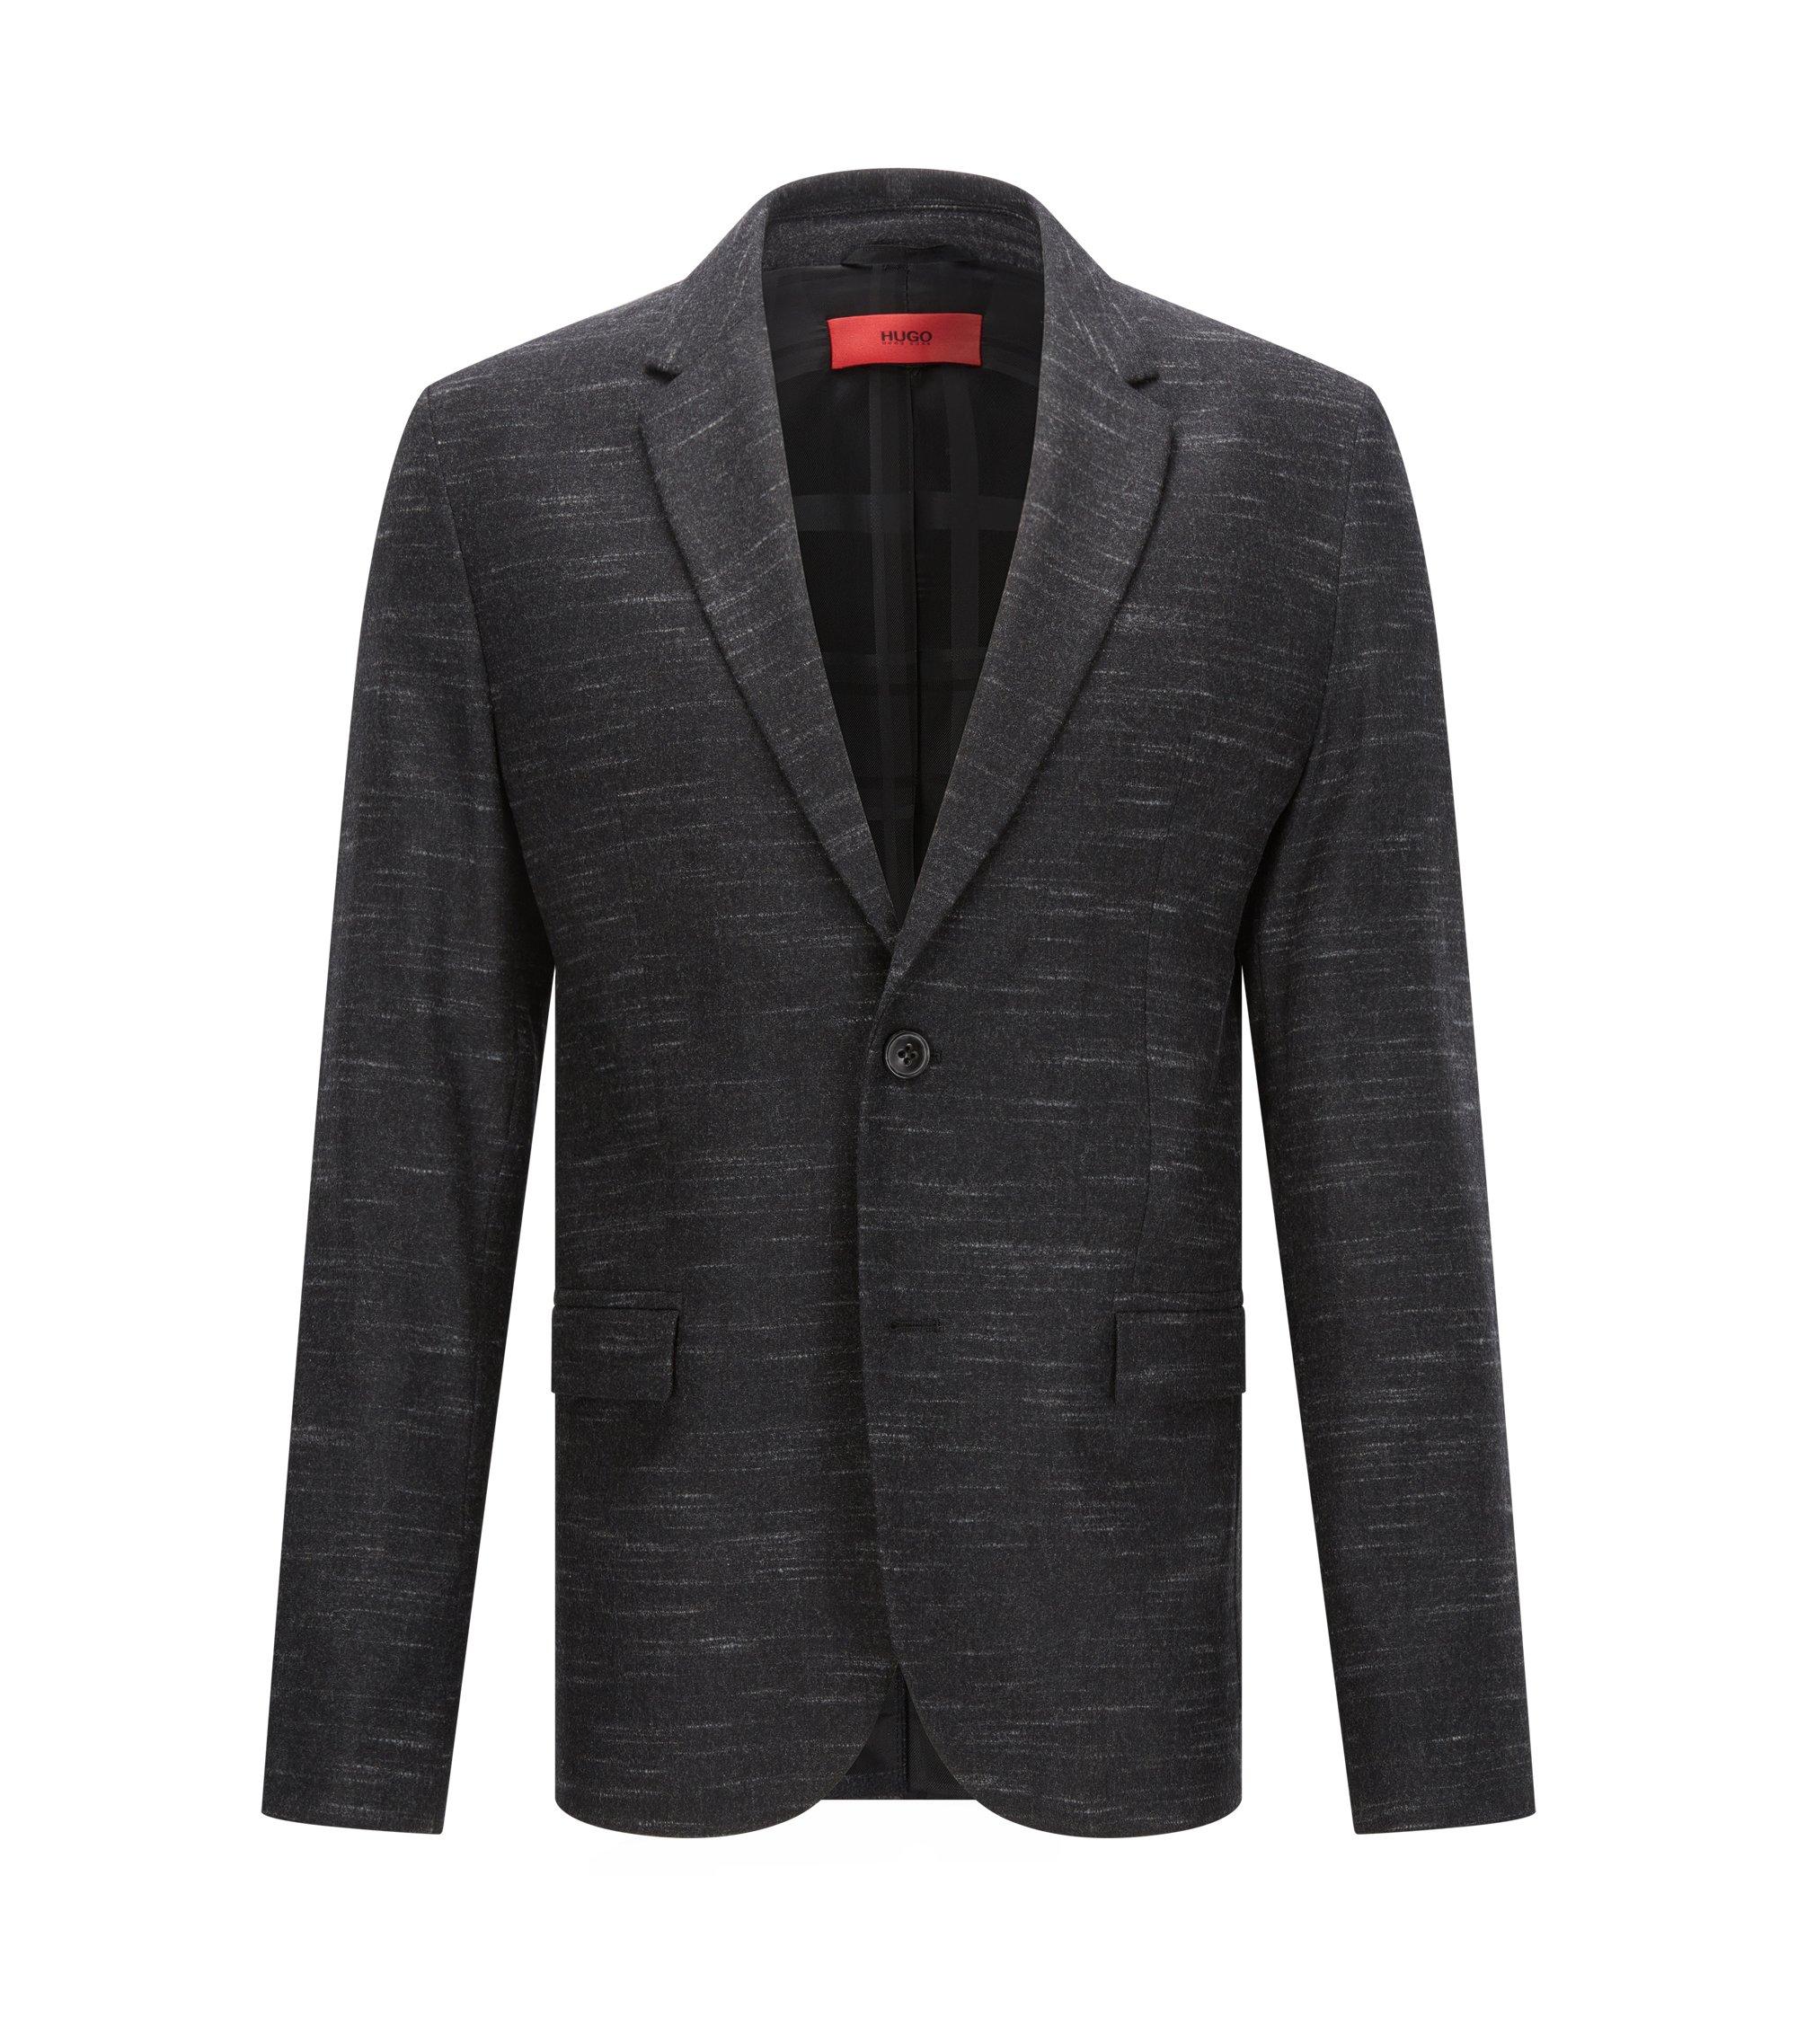 Heathered Virgin Wool Blend Sport Coat, Slim Fit   Arelton, Charcoal